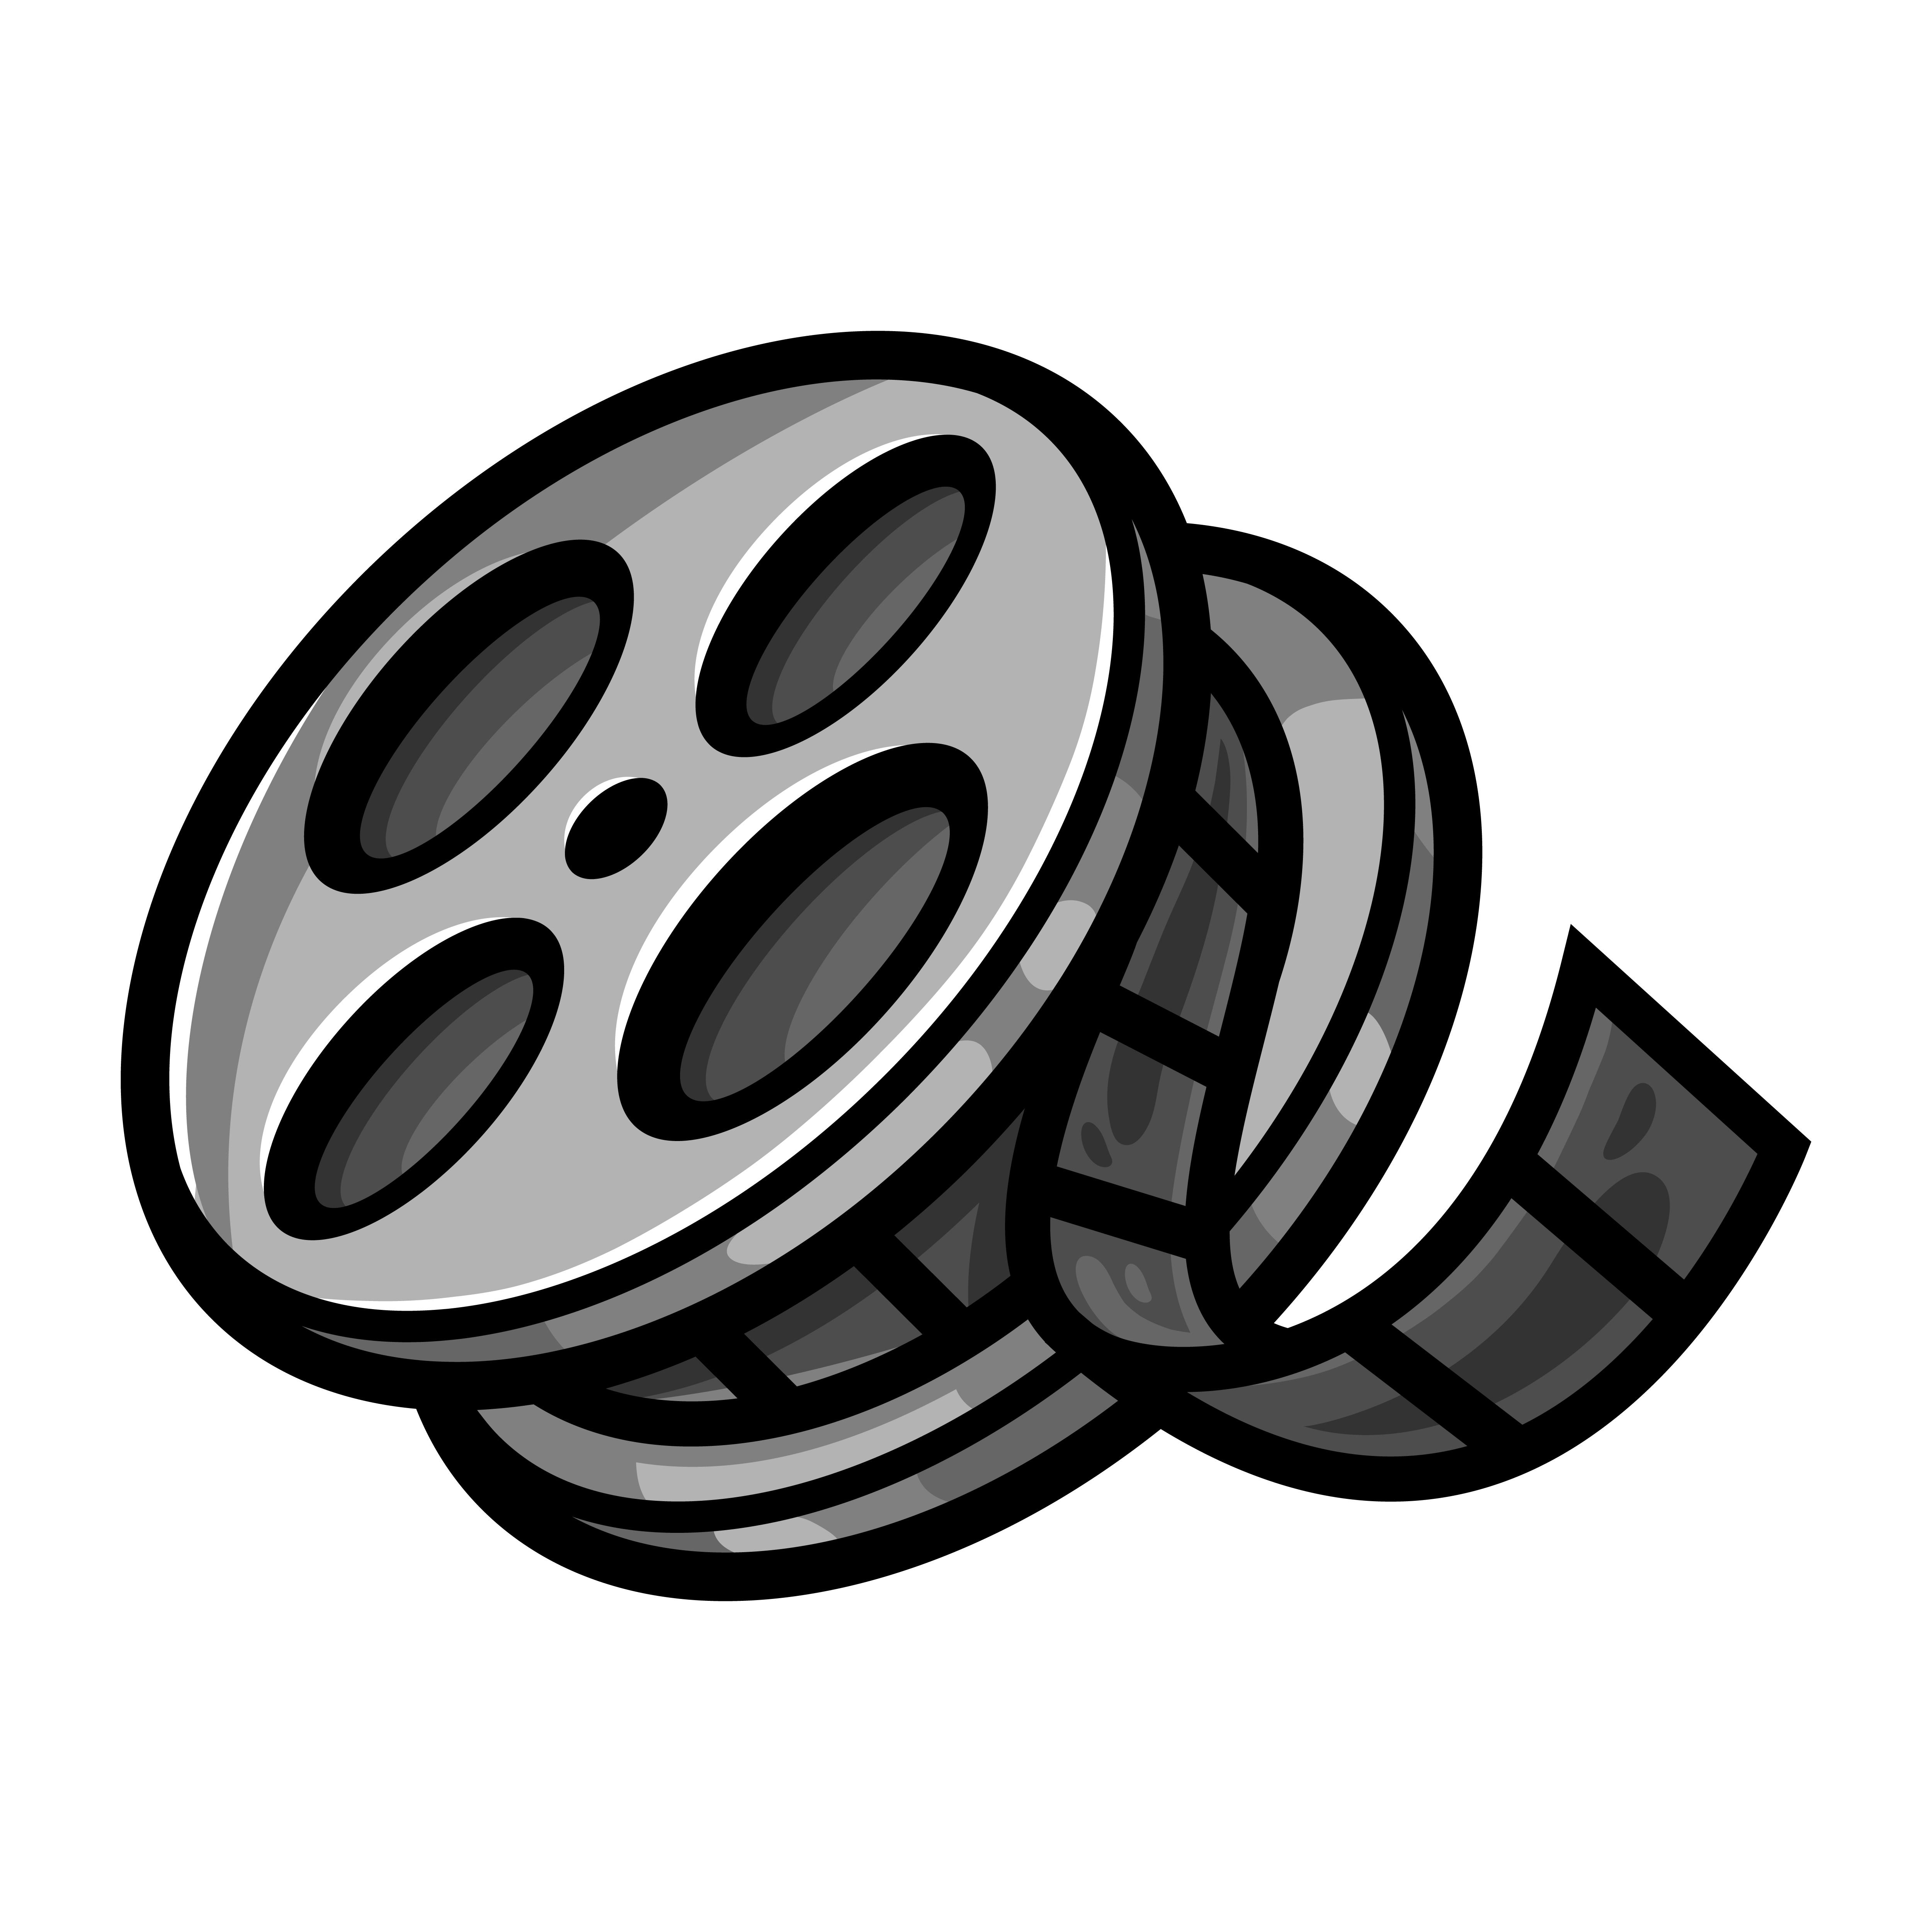 Movie Theater Cinema Film Reel Unspooling Download Free Vectors Clipart Graphics Vector Art